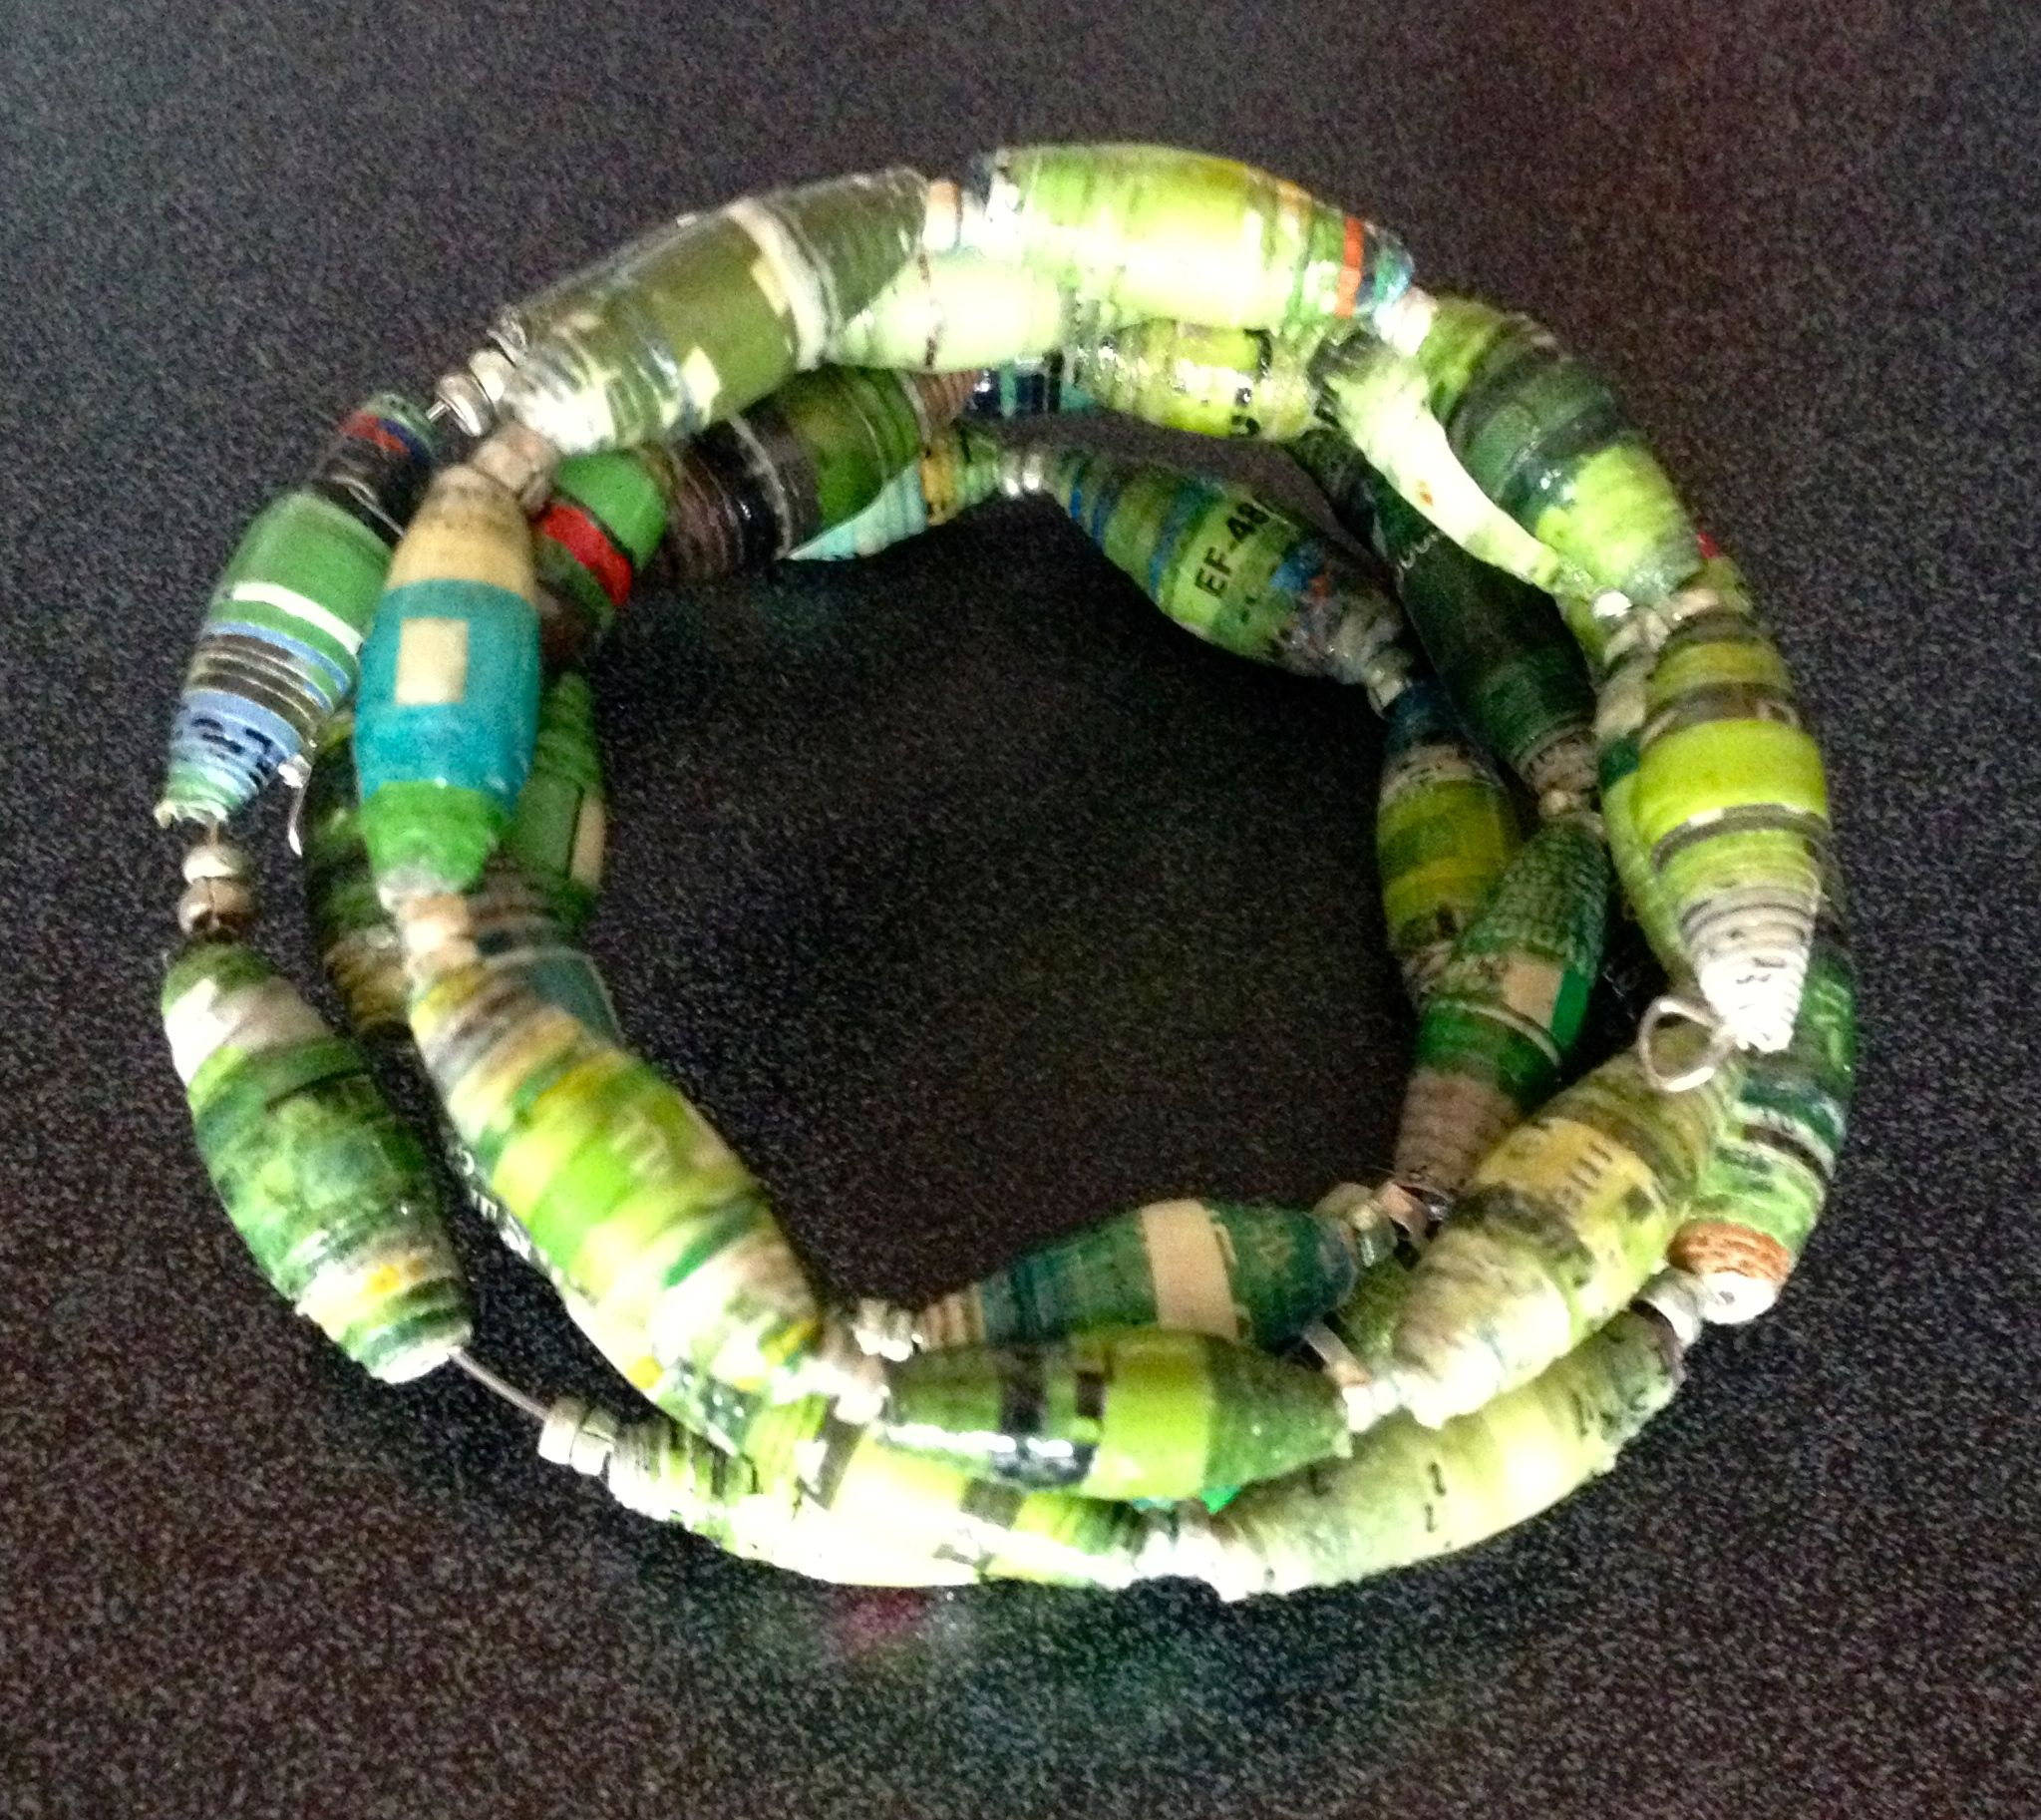 Spiral Paper Bead Bracelets to benefit EHE